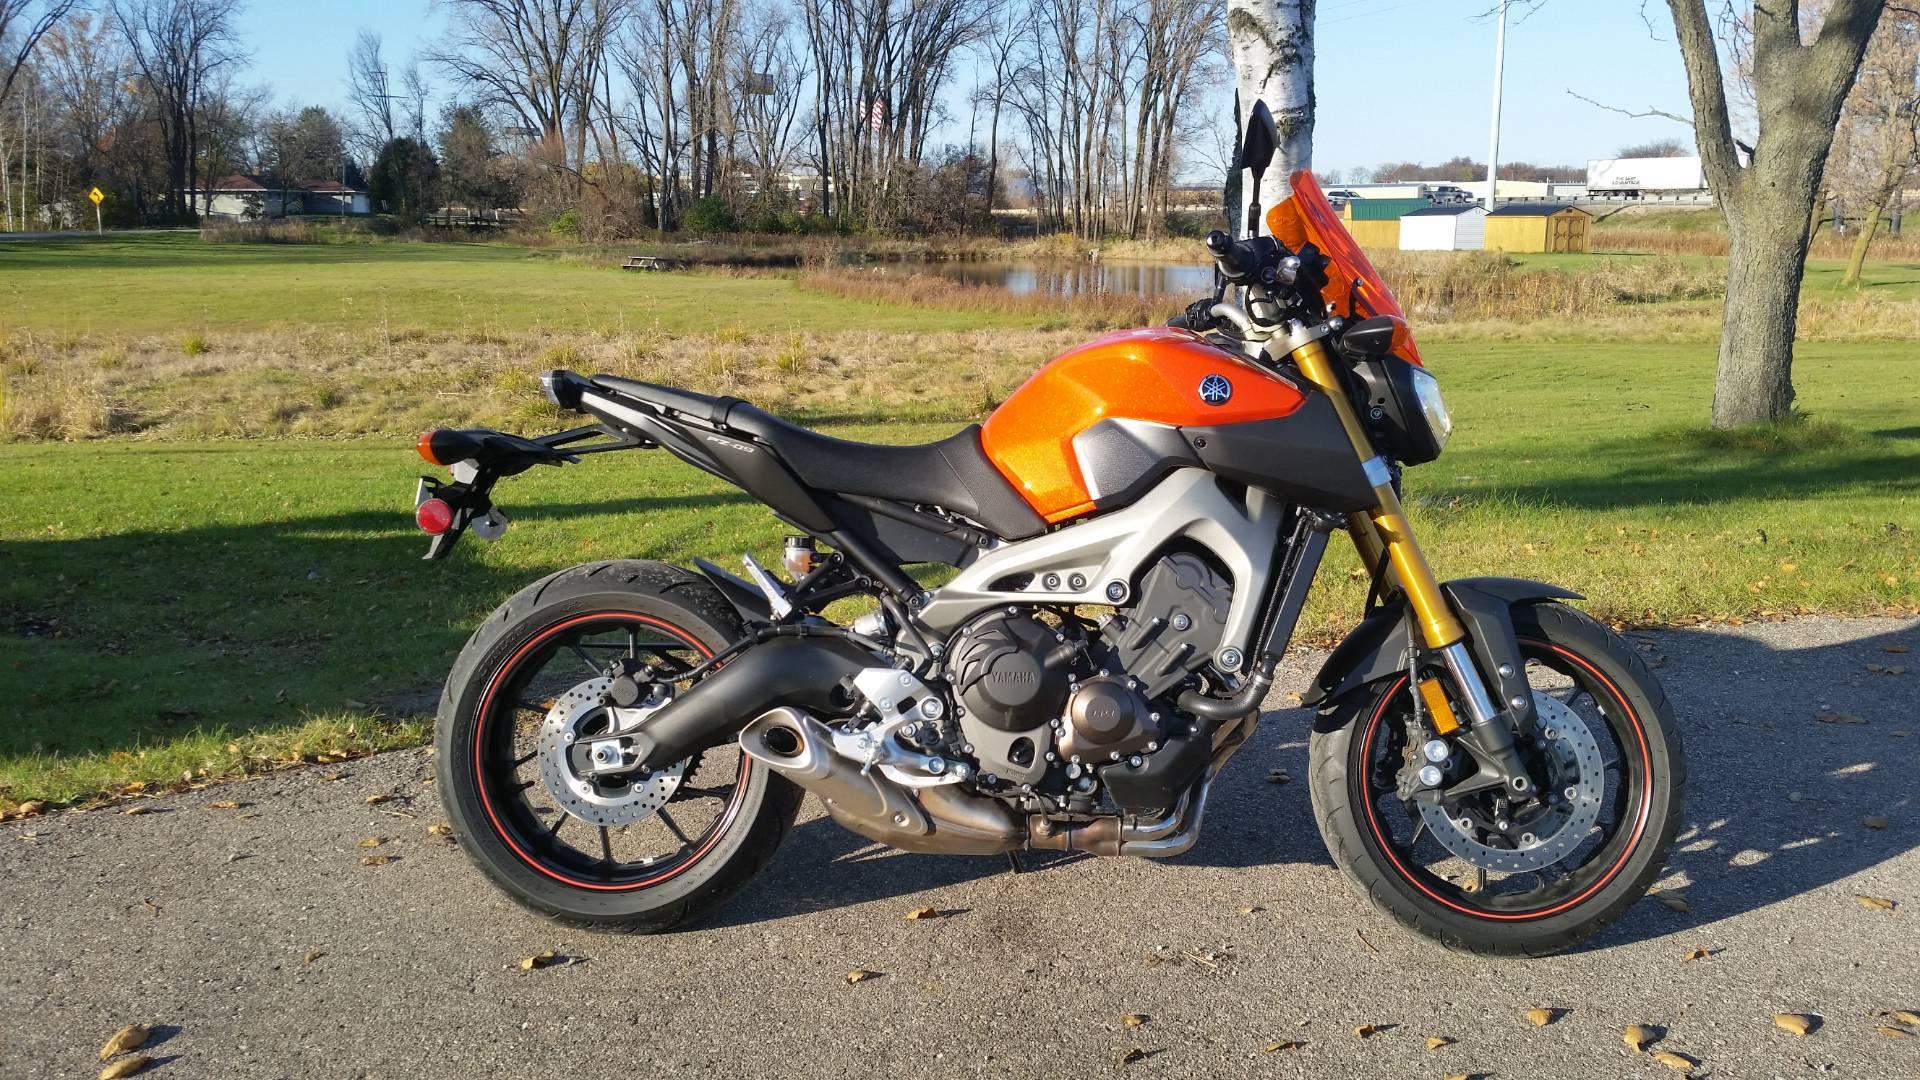 2014 Yamaha FZ-09 for sale 15174